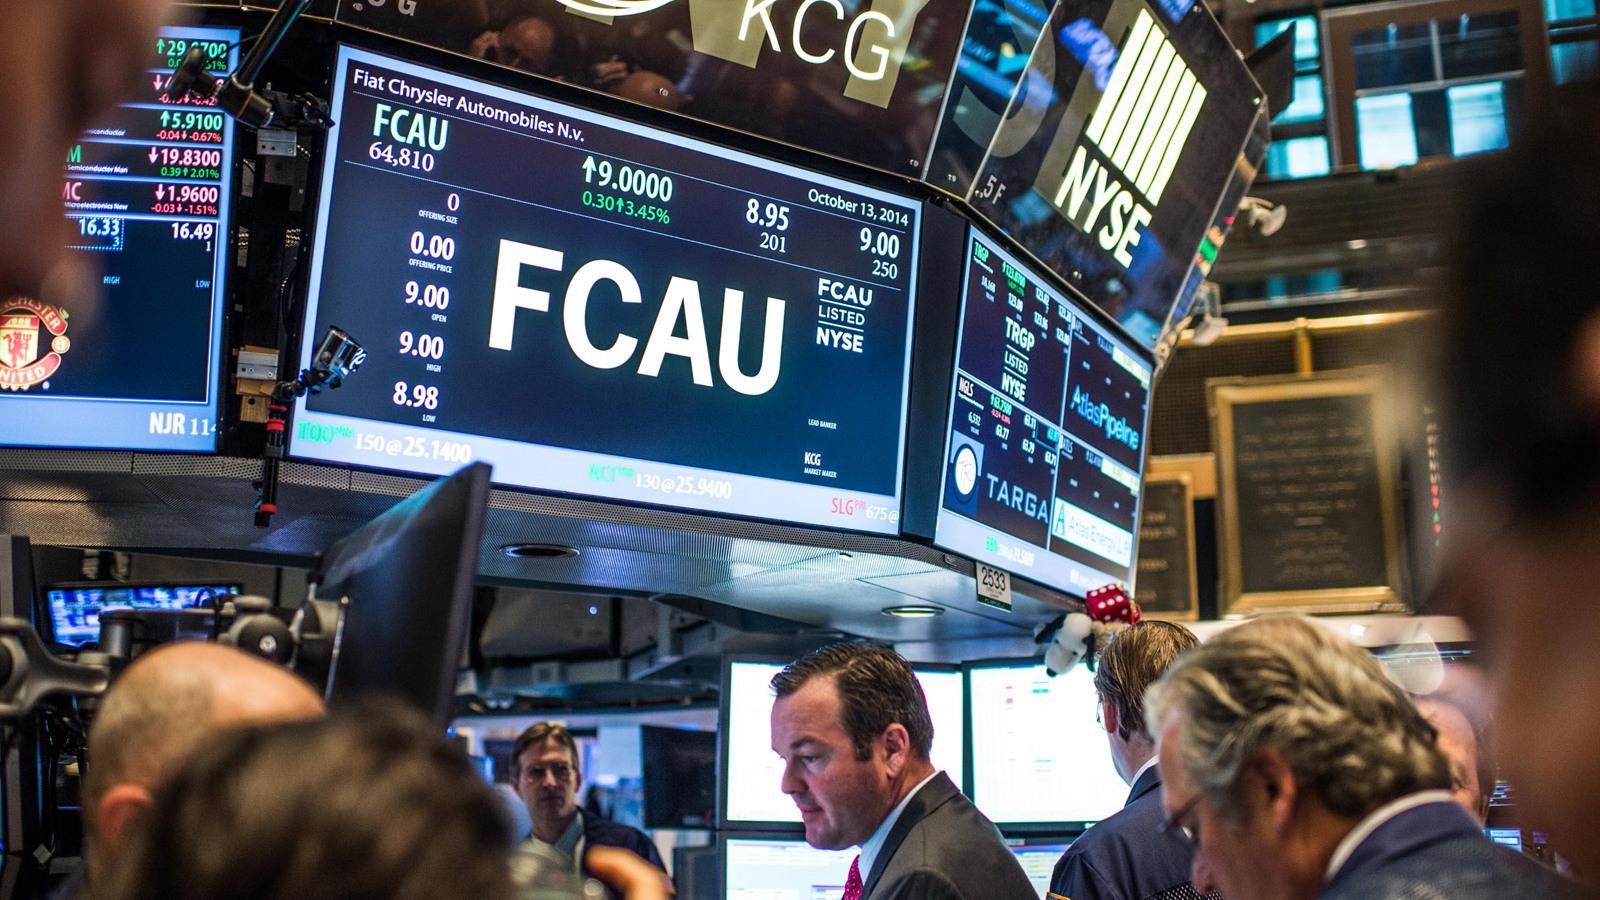 Fiat Chrysler Automobiles starts trading on the New York Stock Exchange